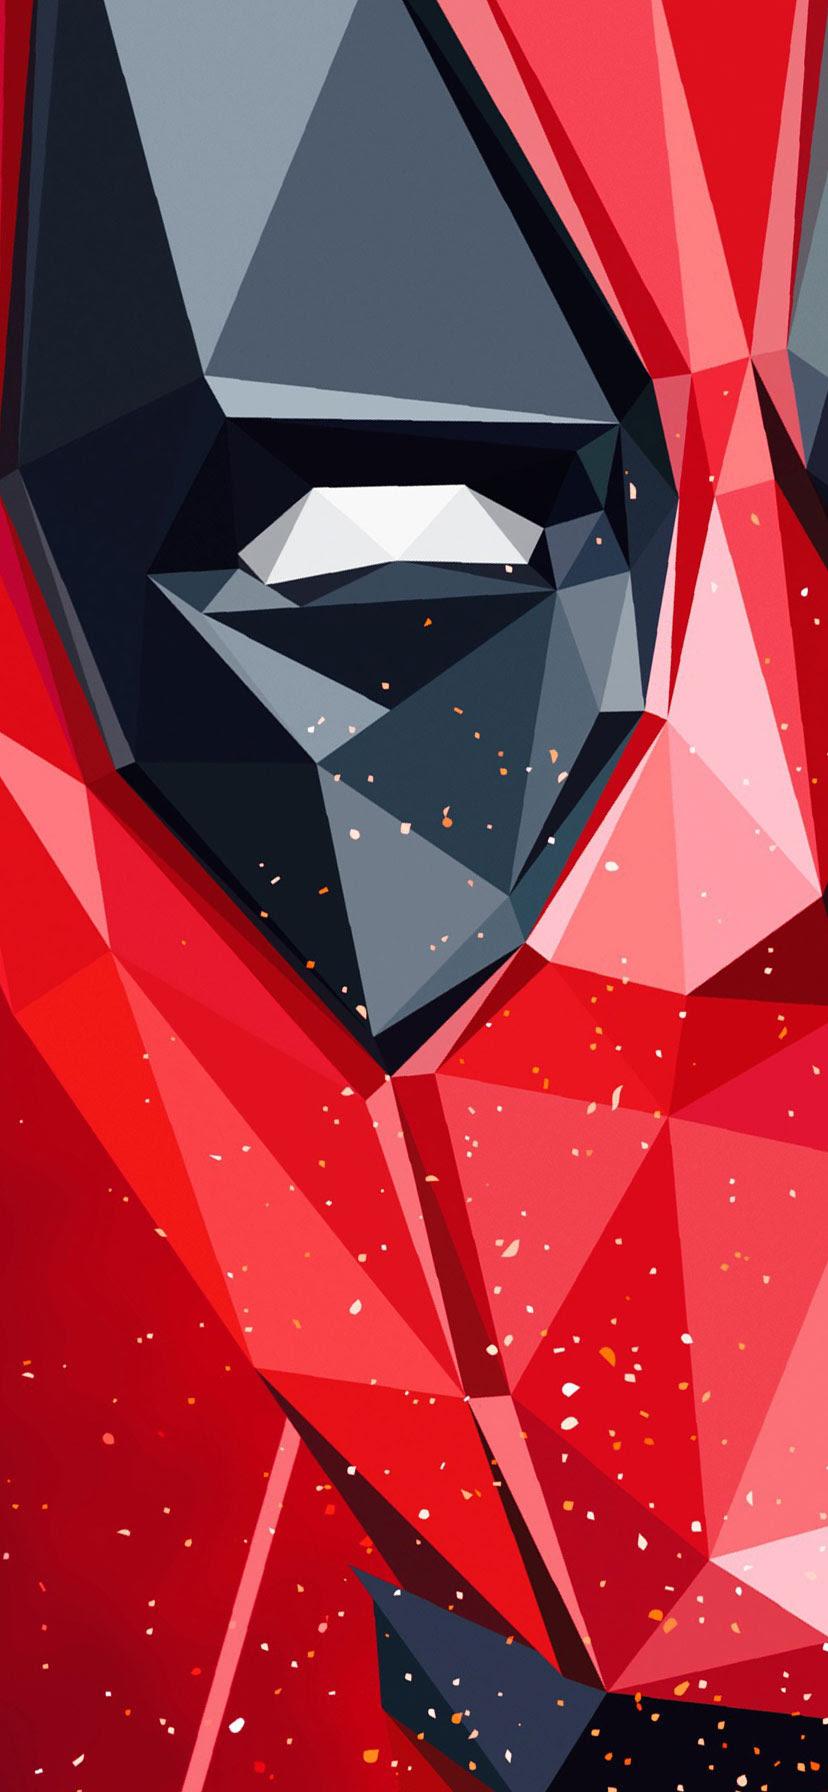 50+ Best High Quality iPhone XR Wallpapers  Backgrounds – Designbolts